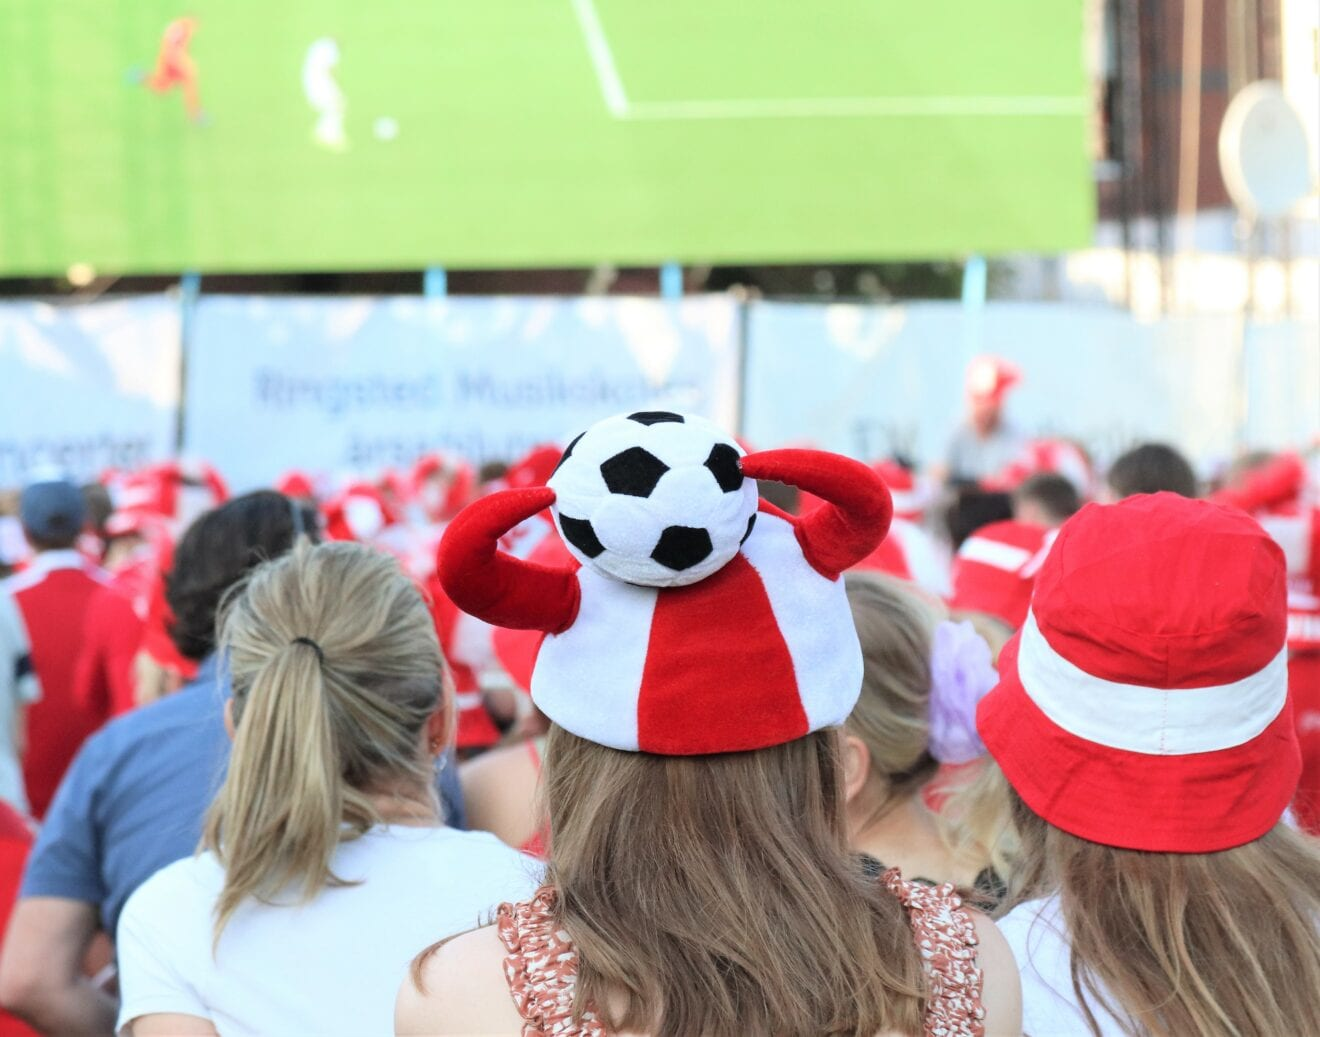 Danmark i kvartfinalen!